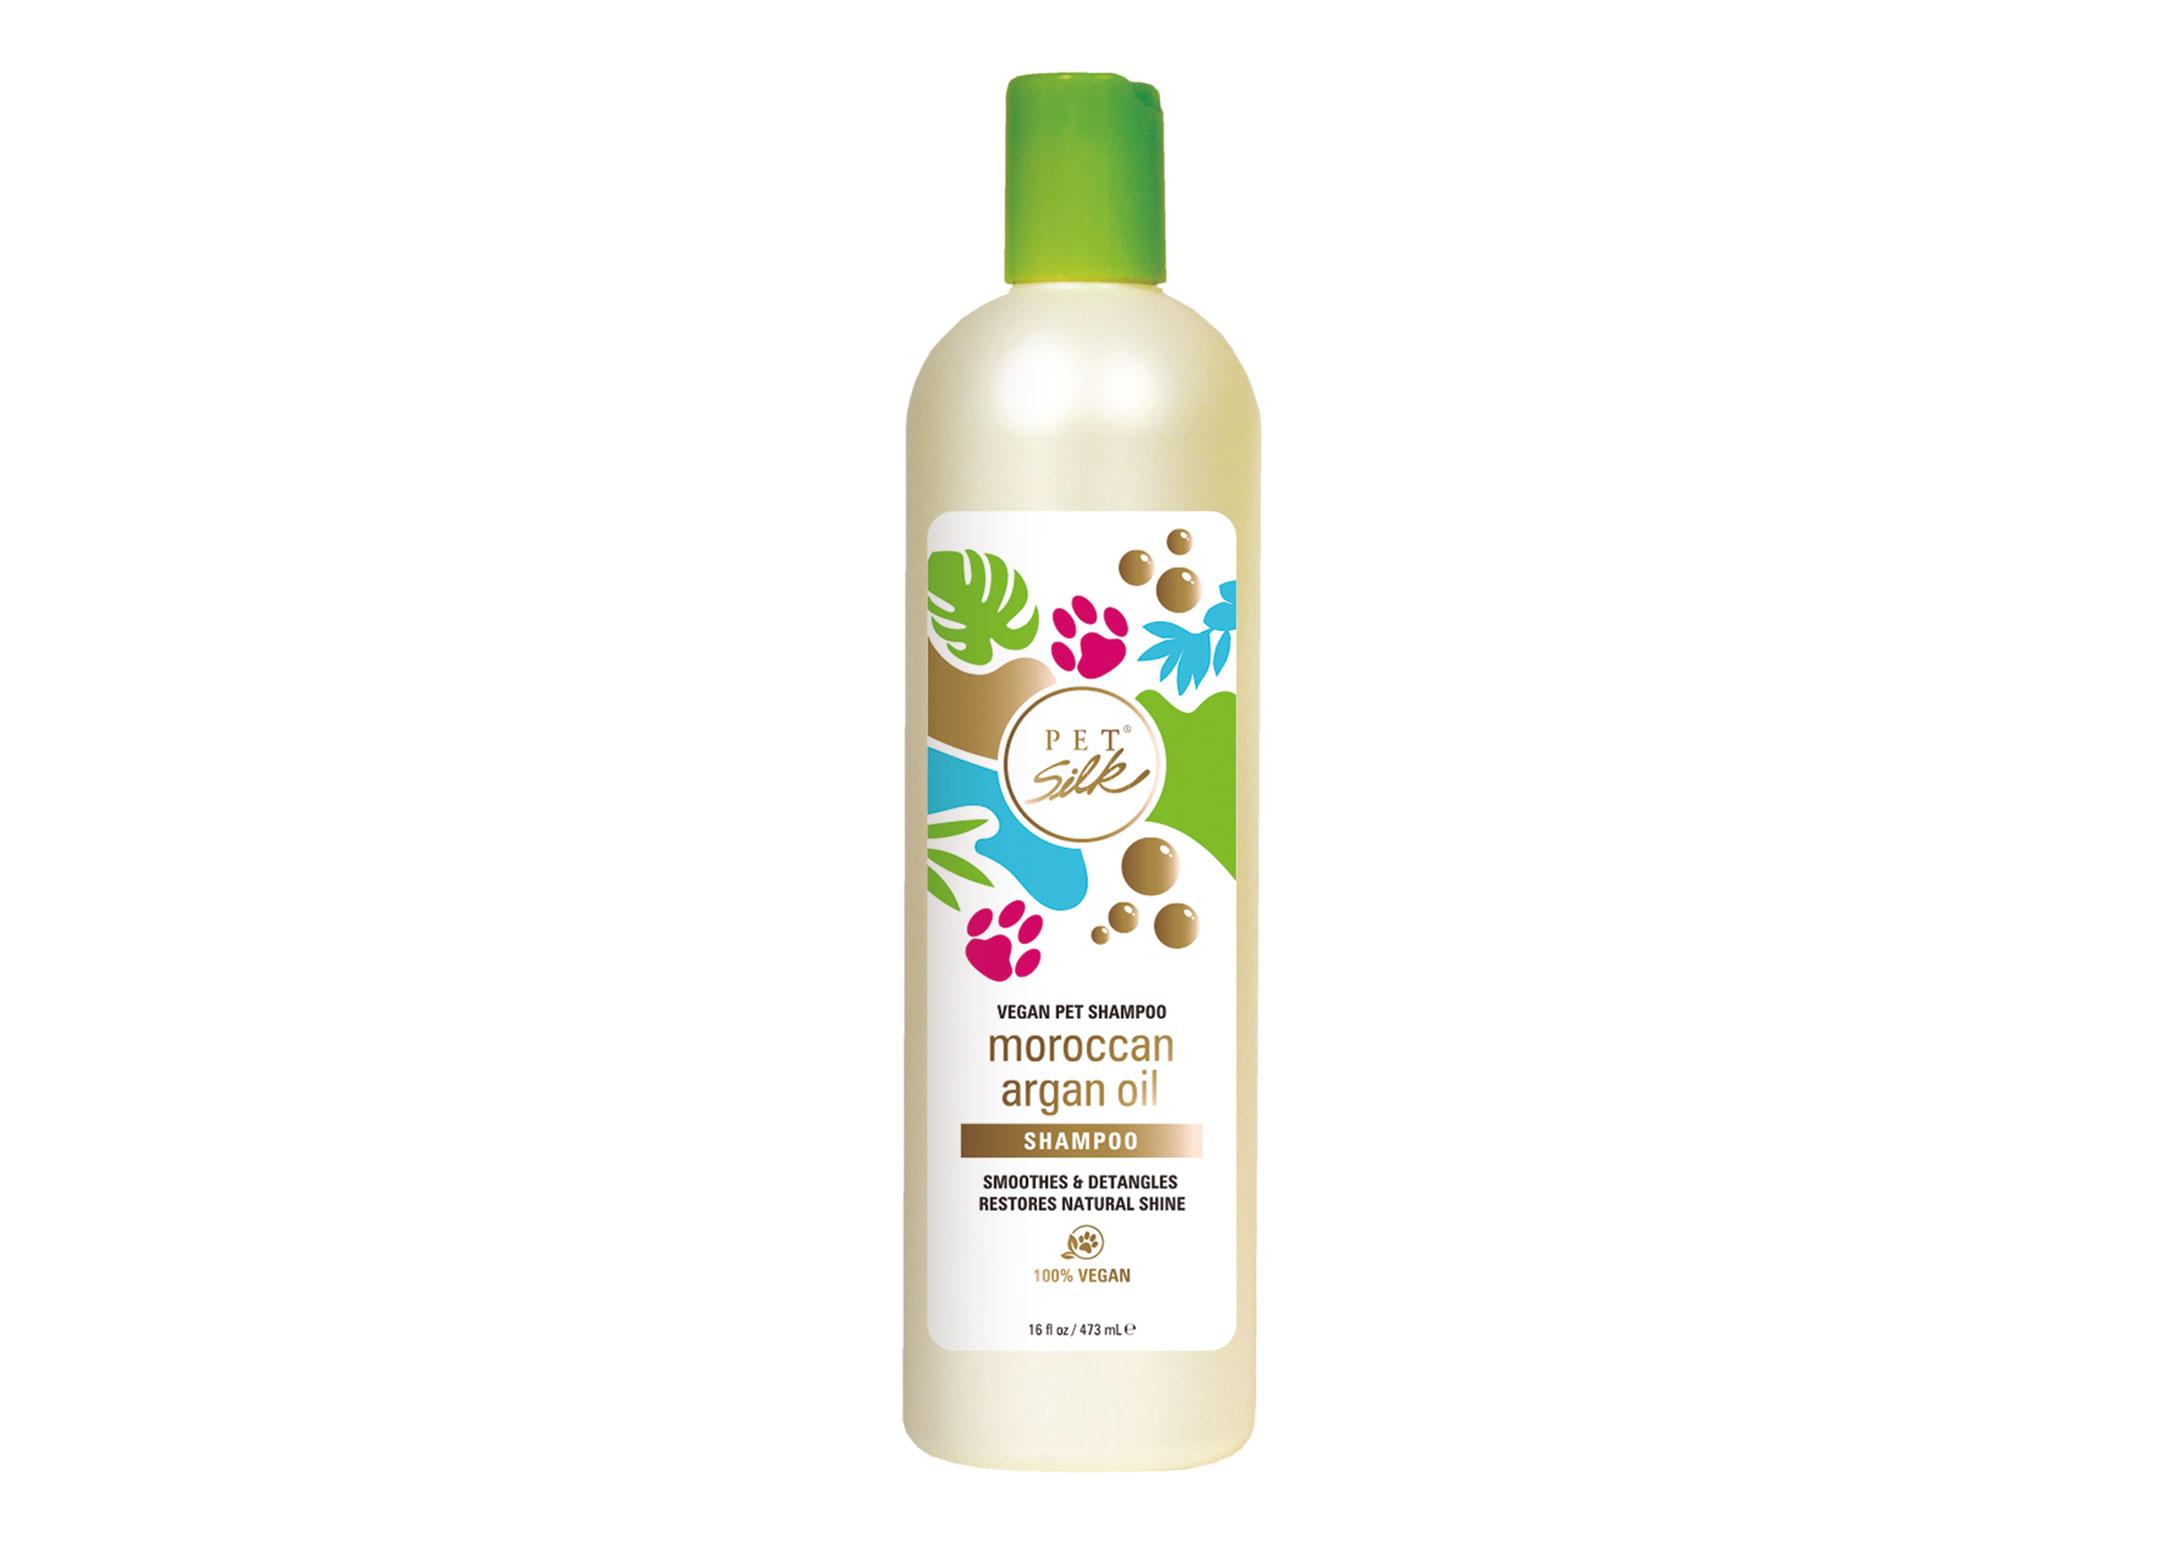 Pet Silk Vegan Moroccan Argan Oil Shampoo